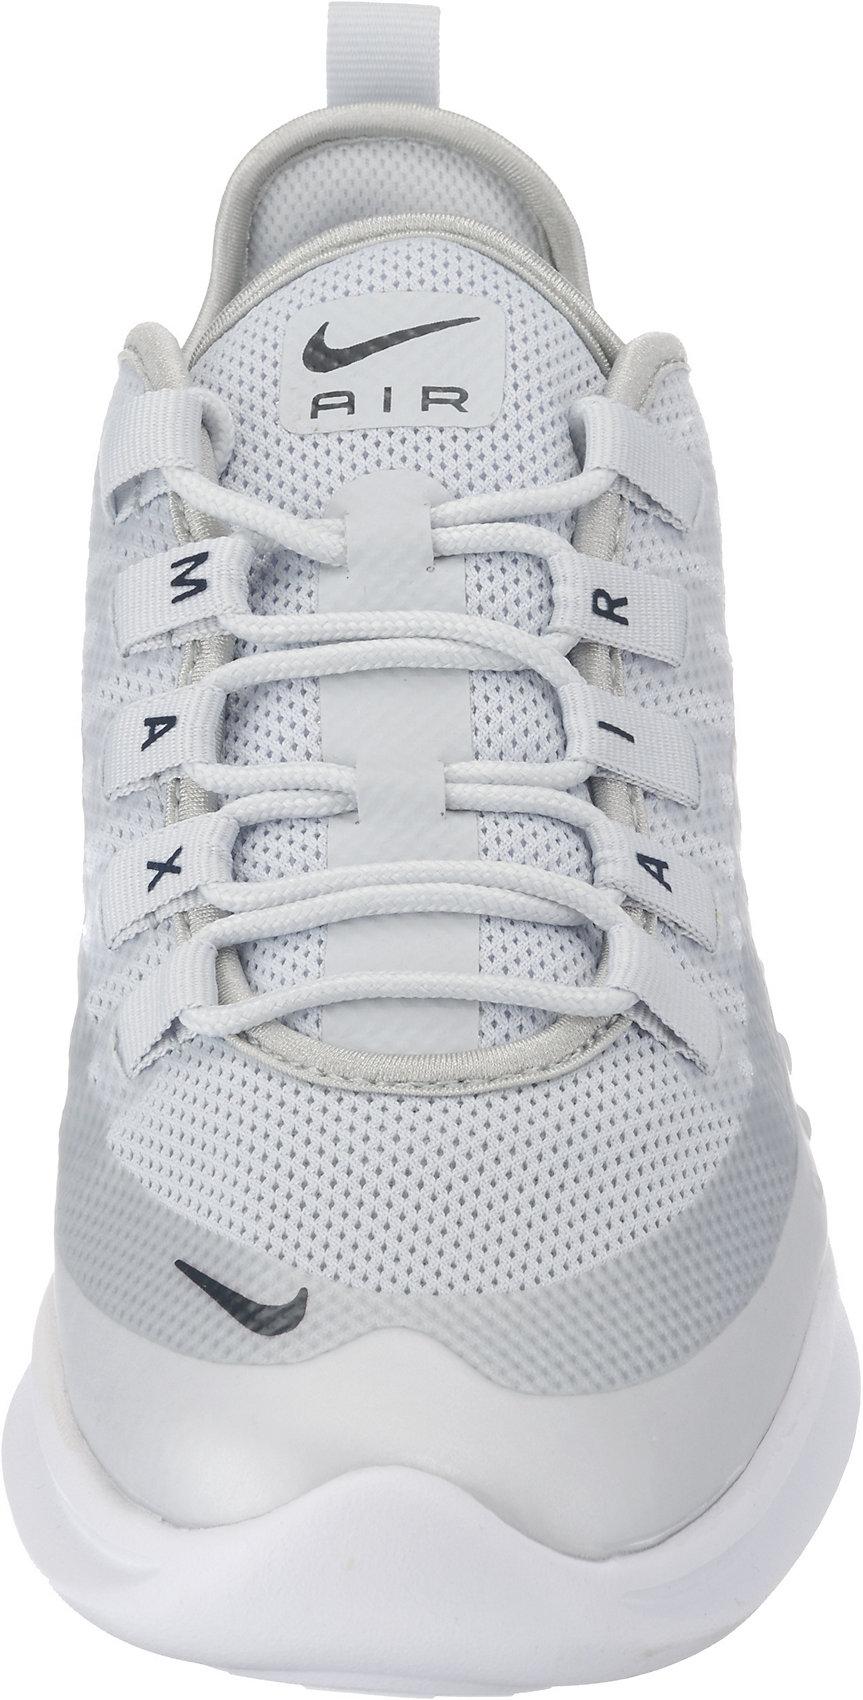 Details zu Neu Nike Sportswear Air Max Axis Sneakers Low 8812994 für Damen